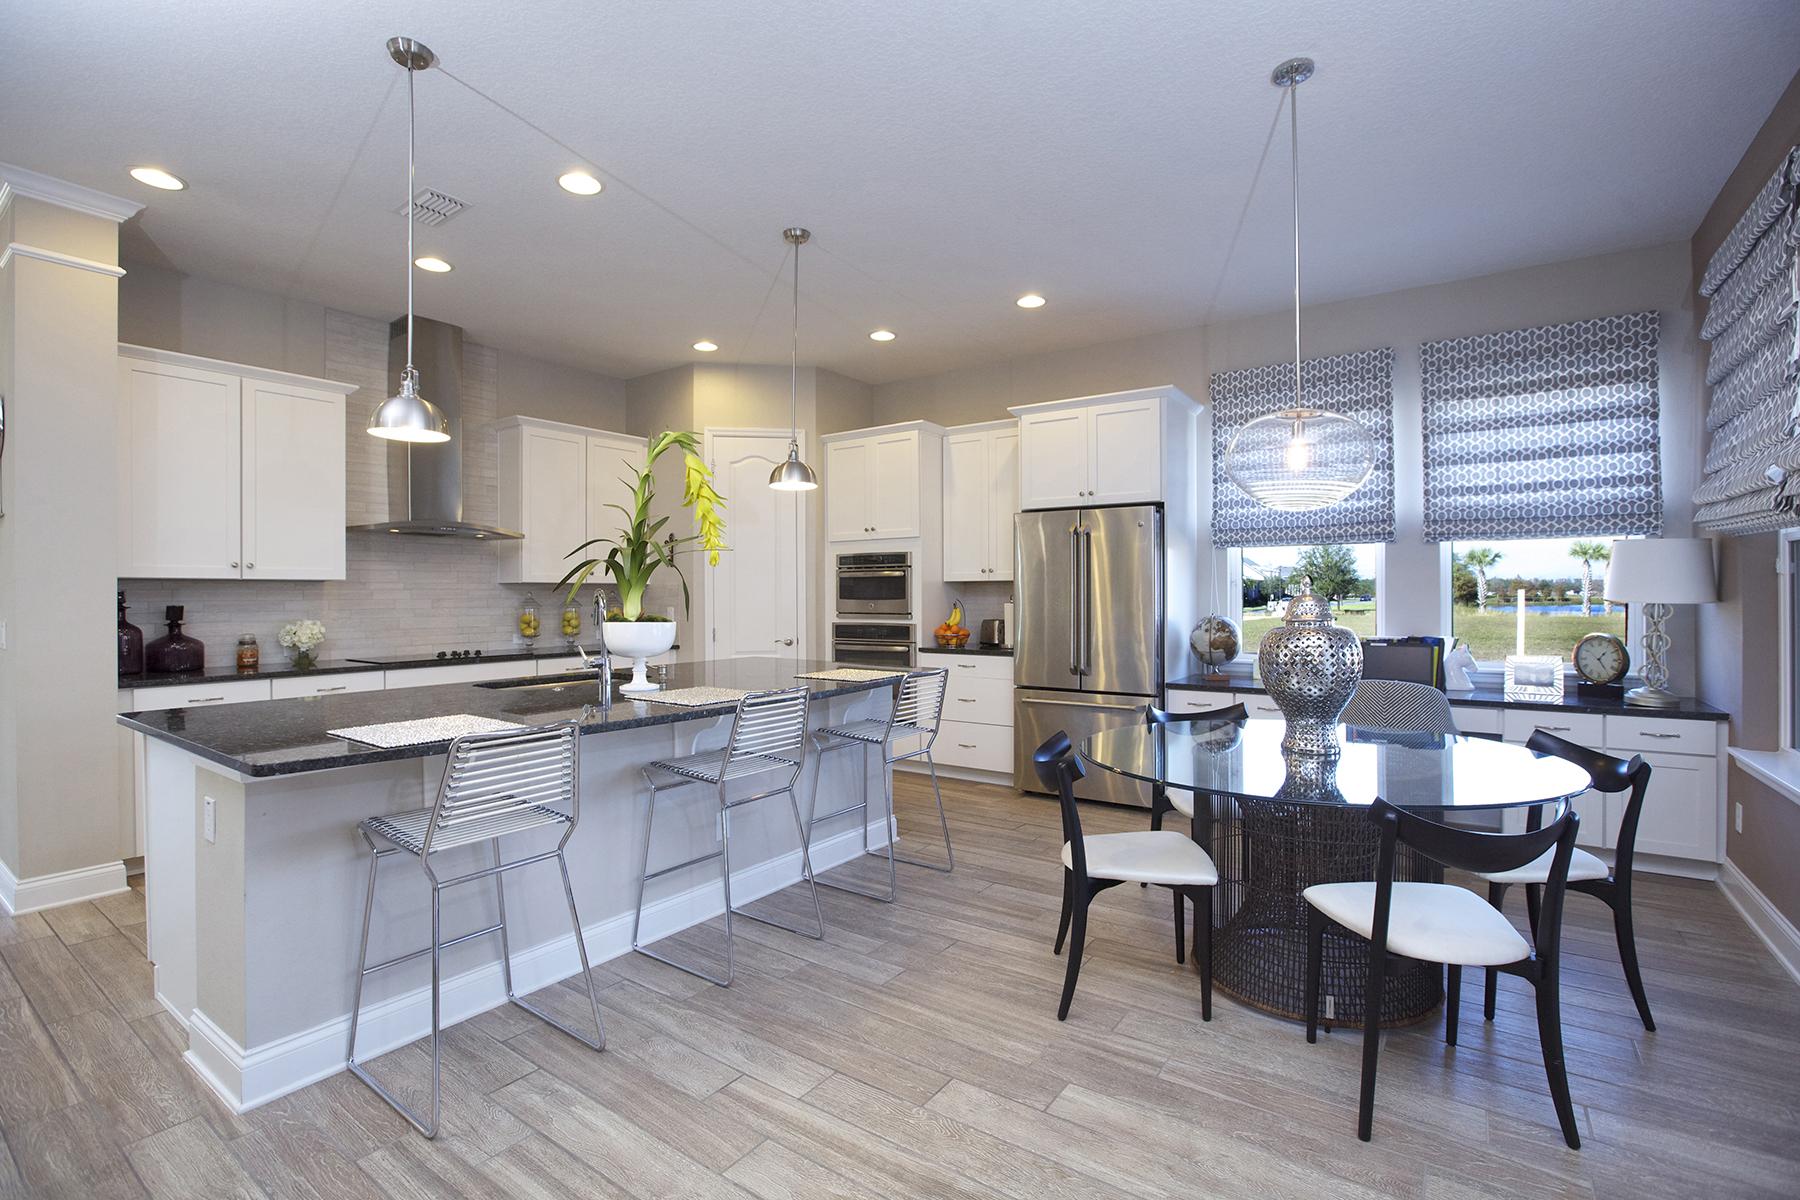 Additional photo for property listing at ORLANDO 13831  Briand Ave,  Orlando, Florida 32827 United States